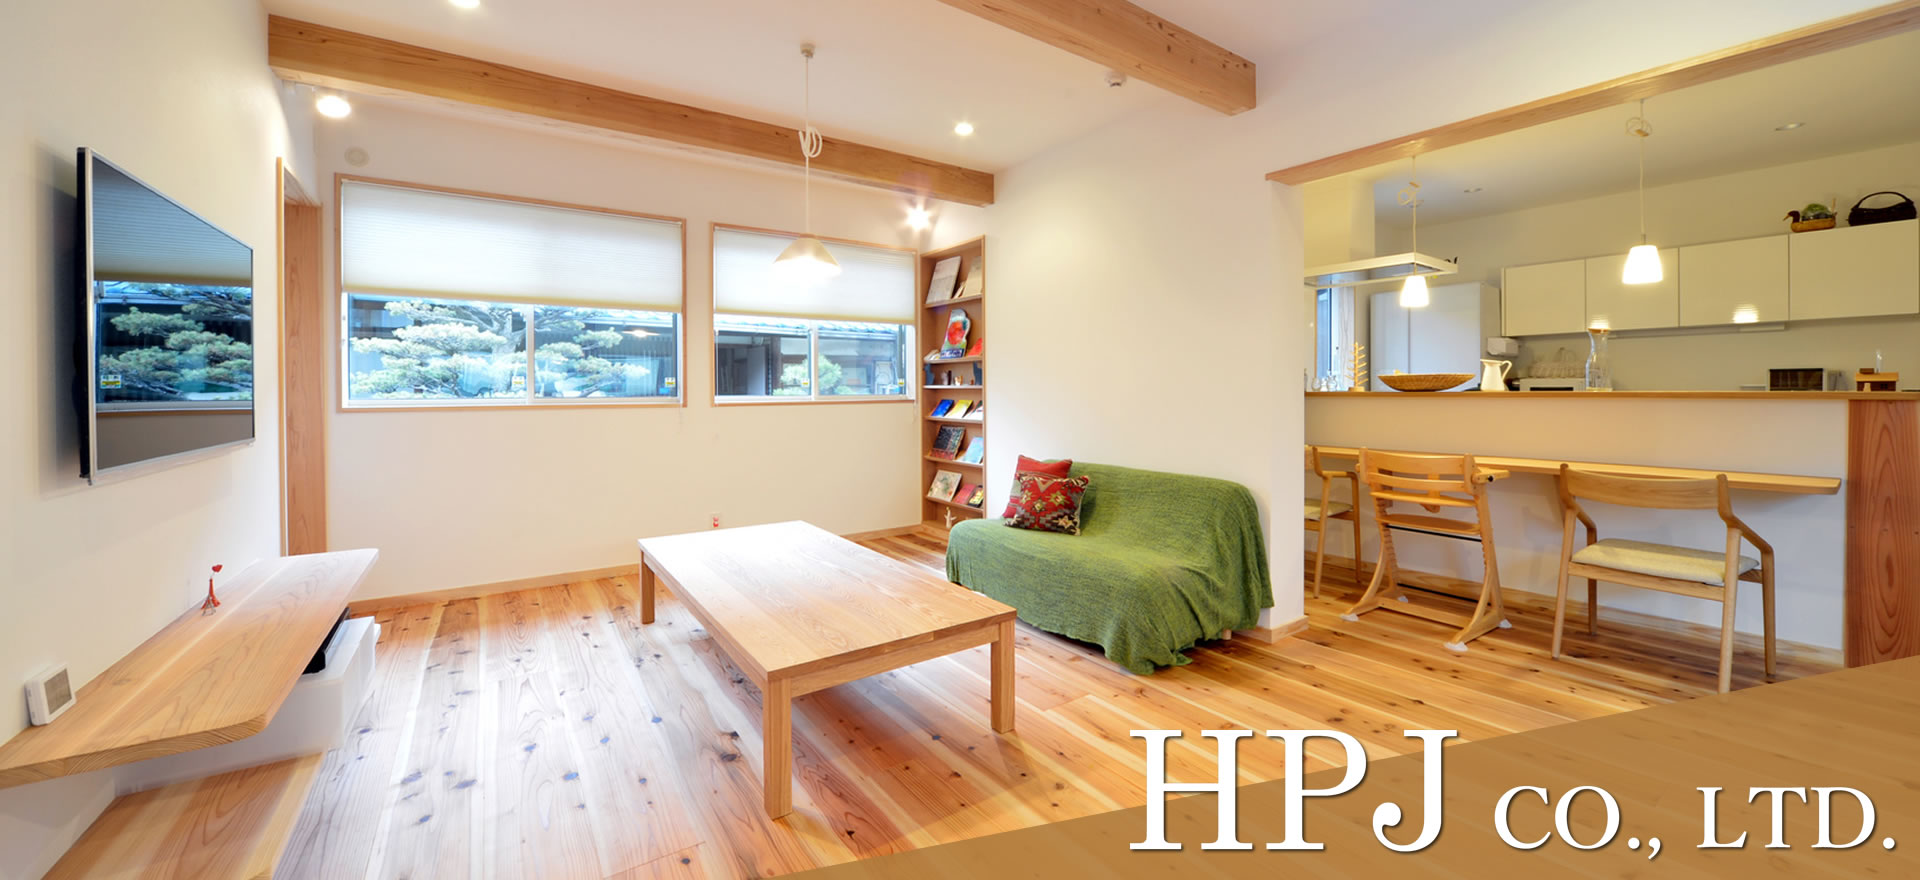 HPJ 株式会社(エイチピージェイ)/広島県福山市/リフォーム・戸建住宅新築工事